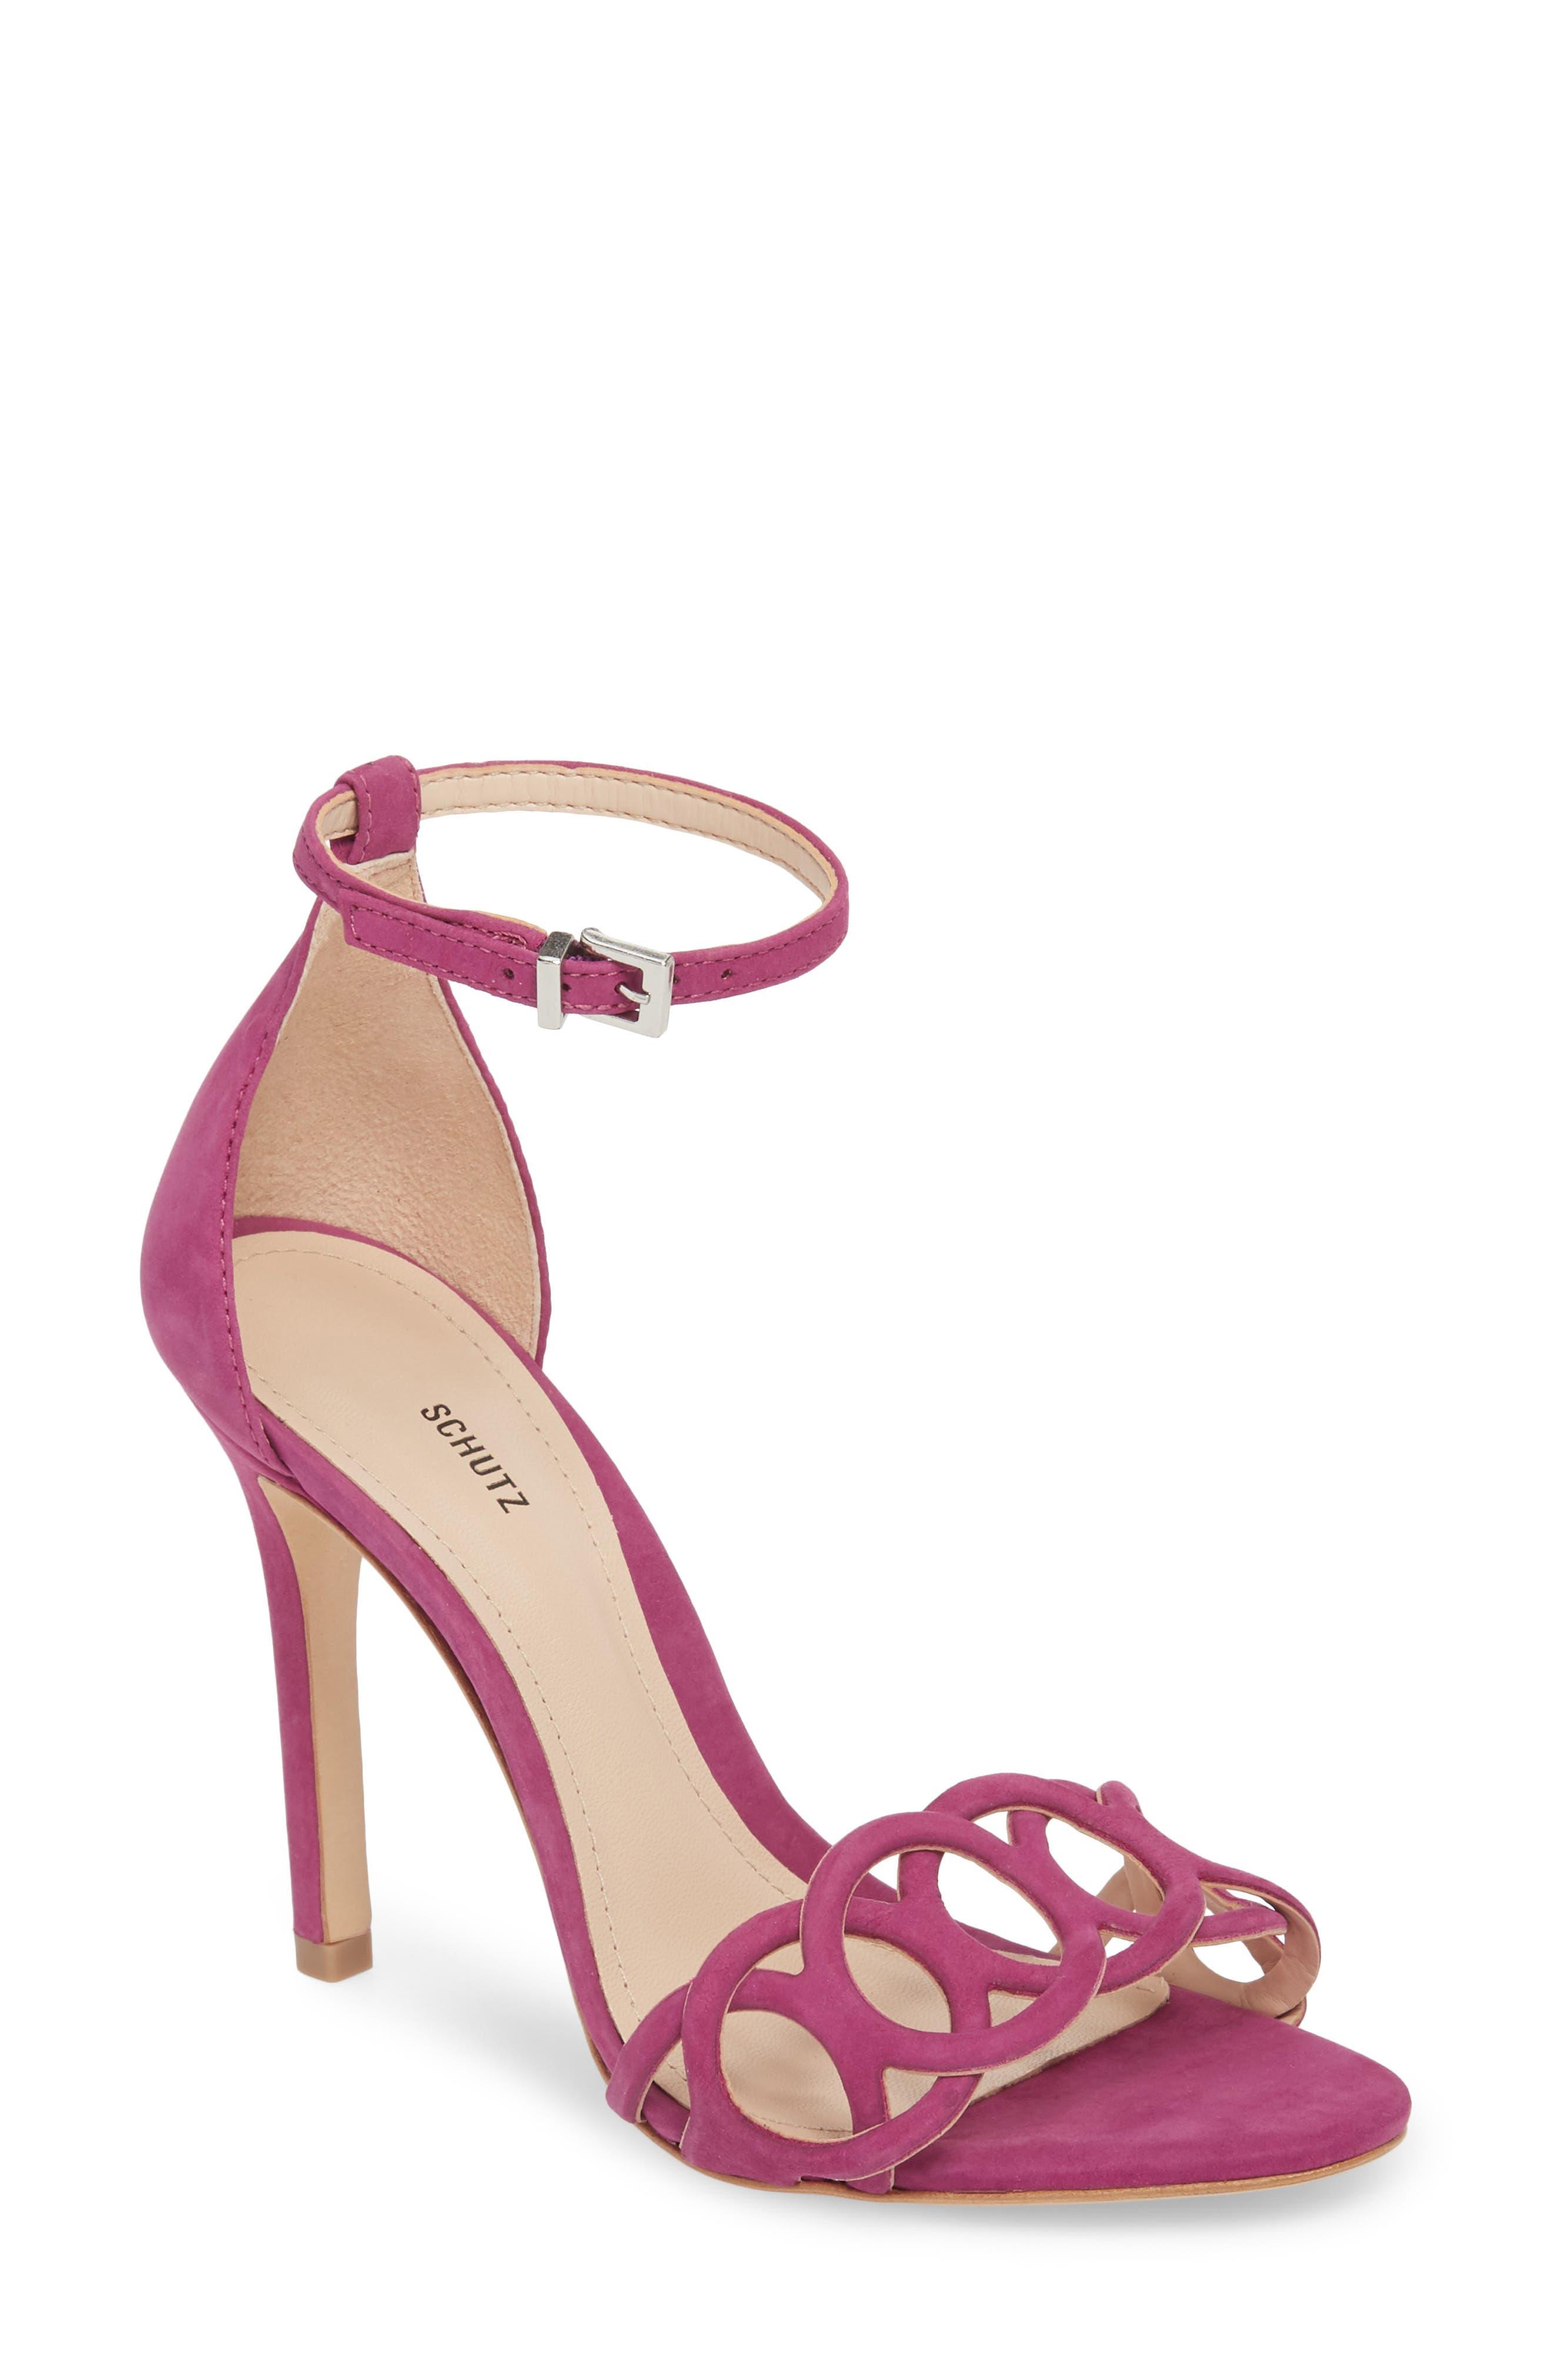 Sthefany Ankle Strap Sandal,                             Main thumbnail 1, color,                             Grape Leather